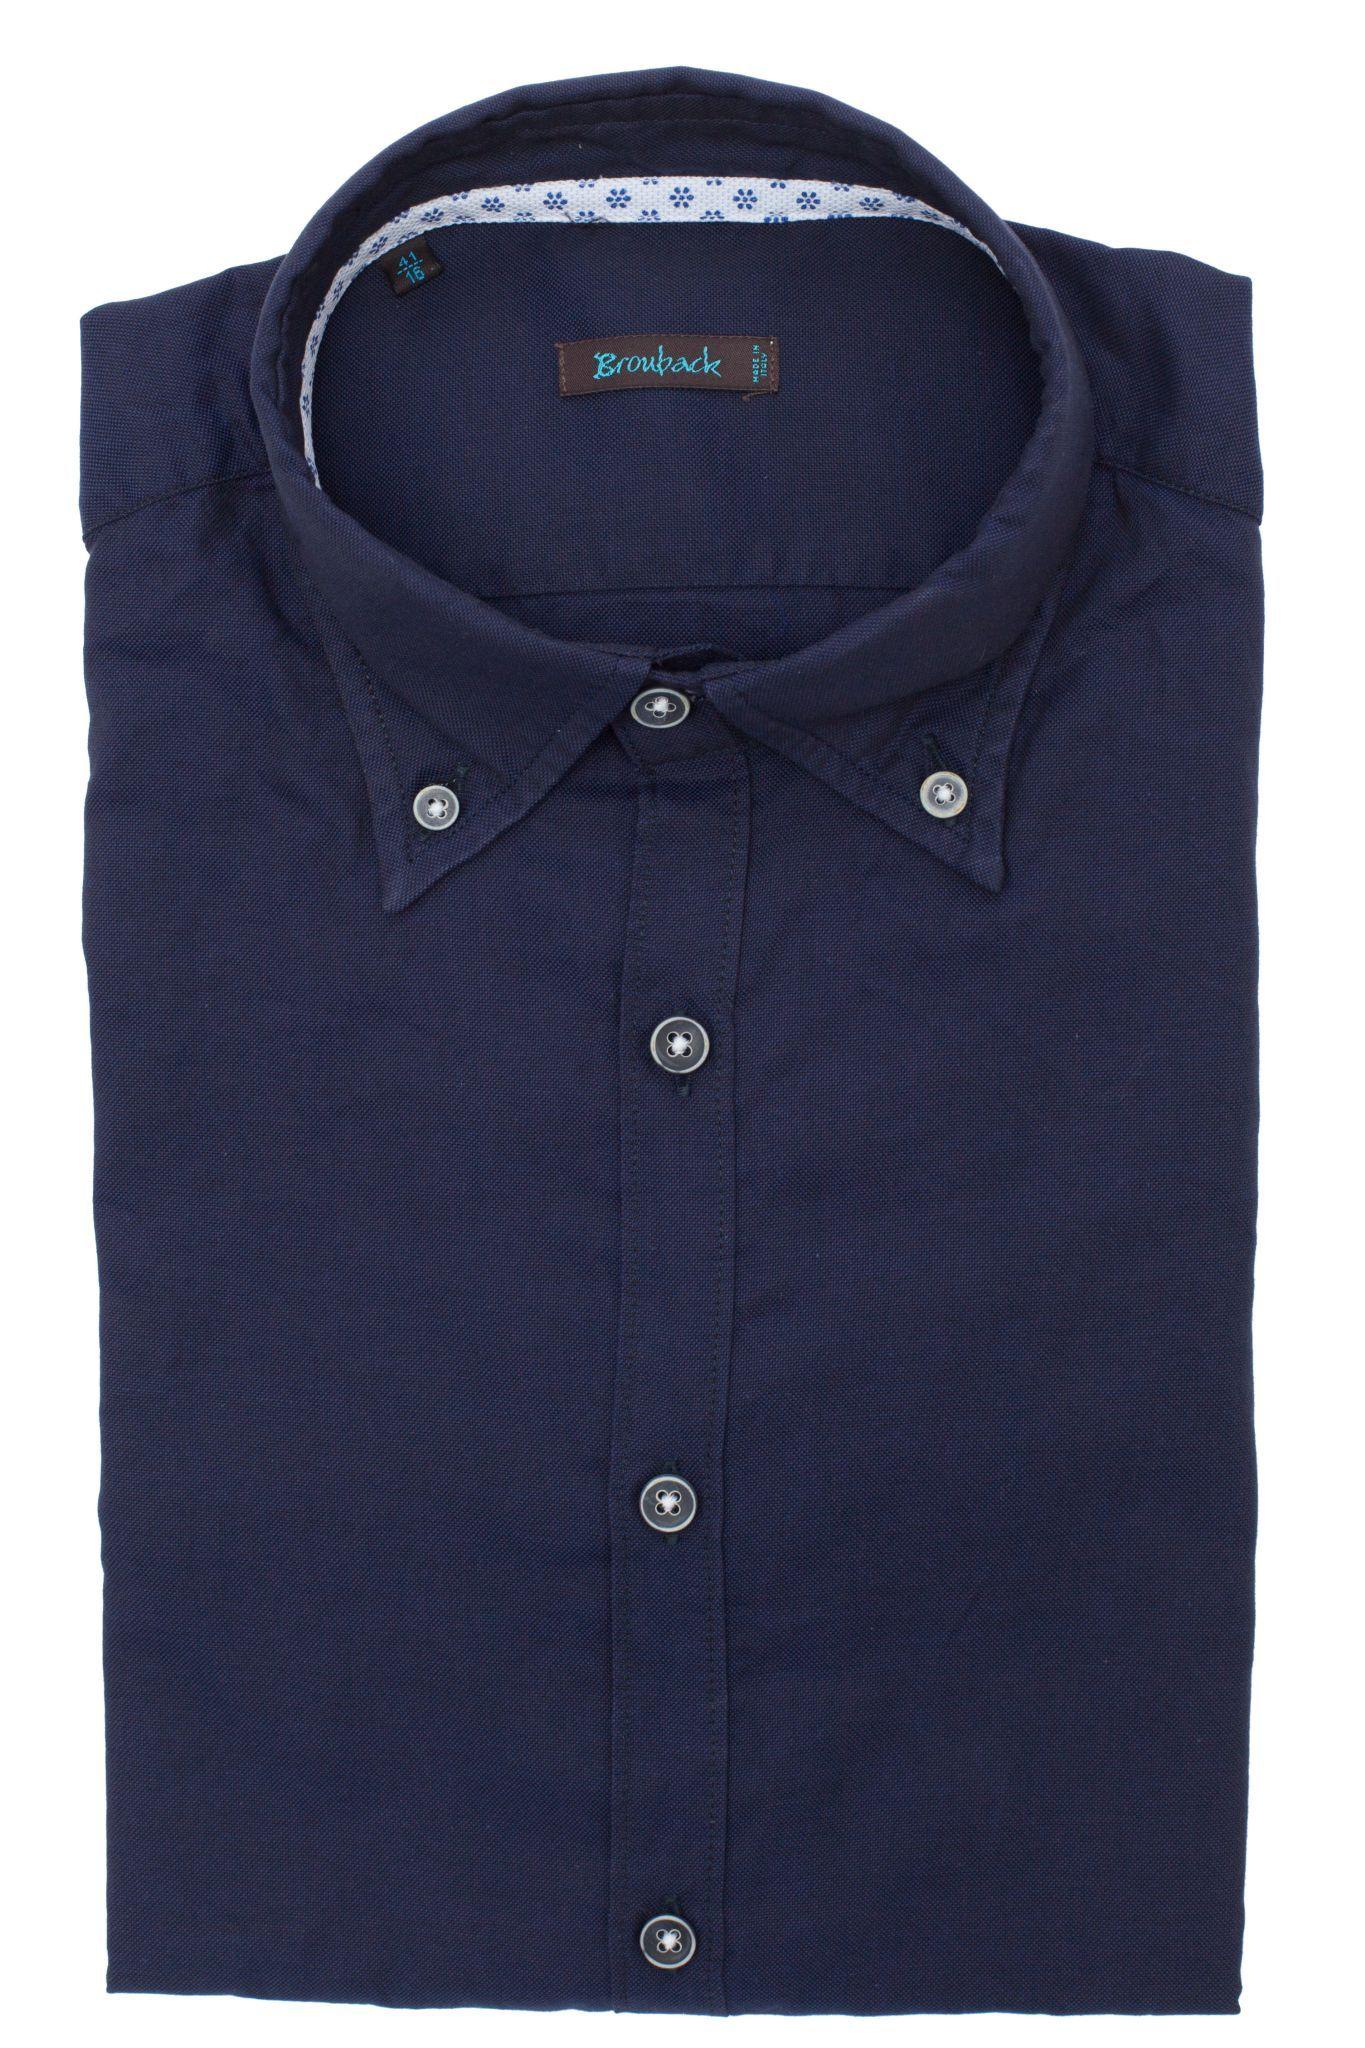 Рубашка глубокого тёмно-синего цвета с воротником на пуговицах